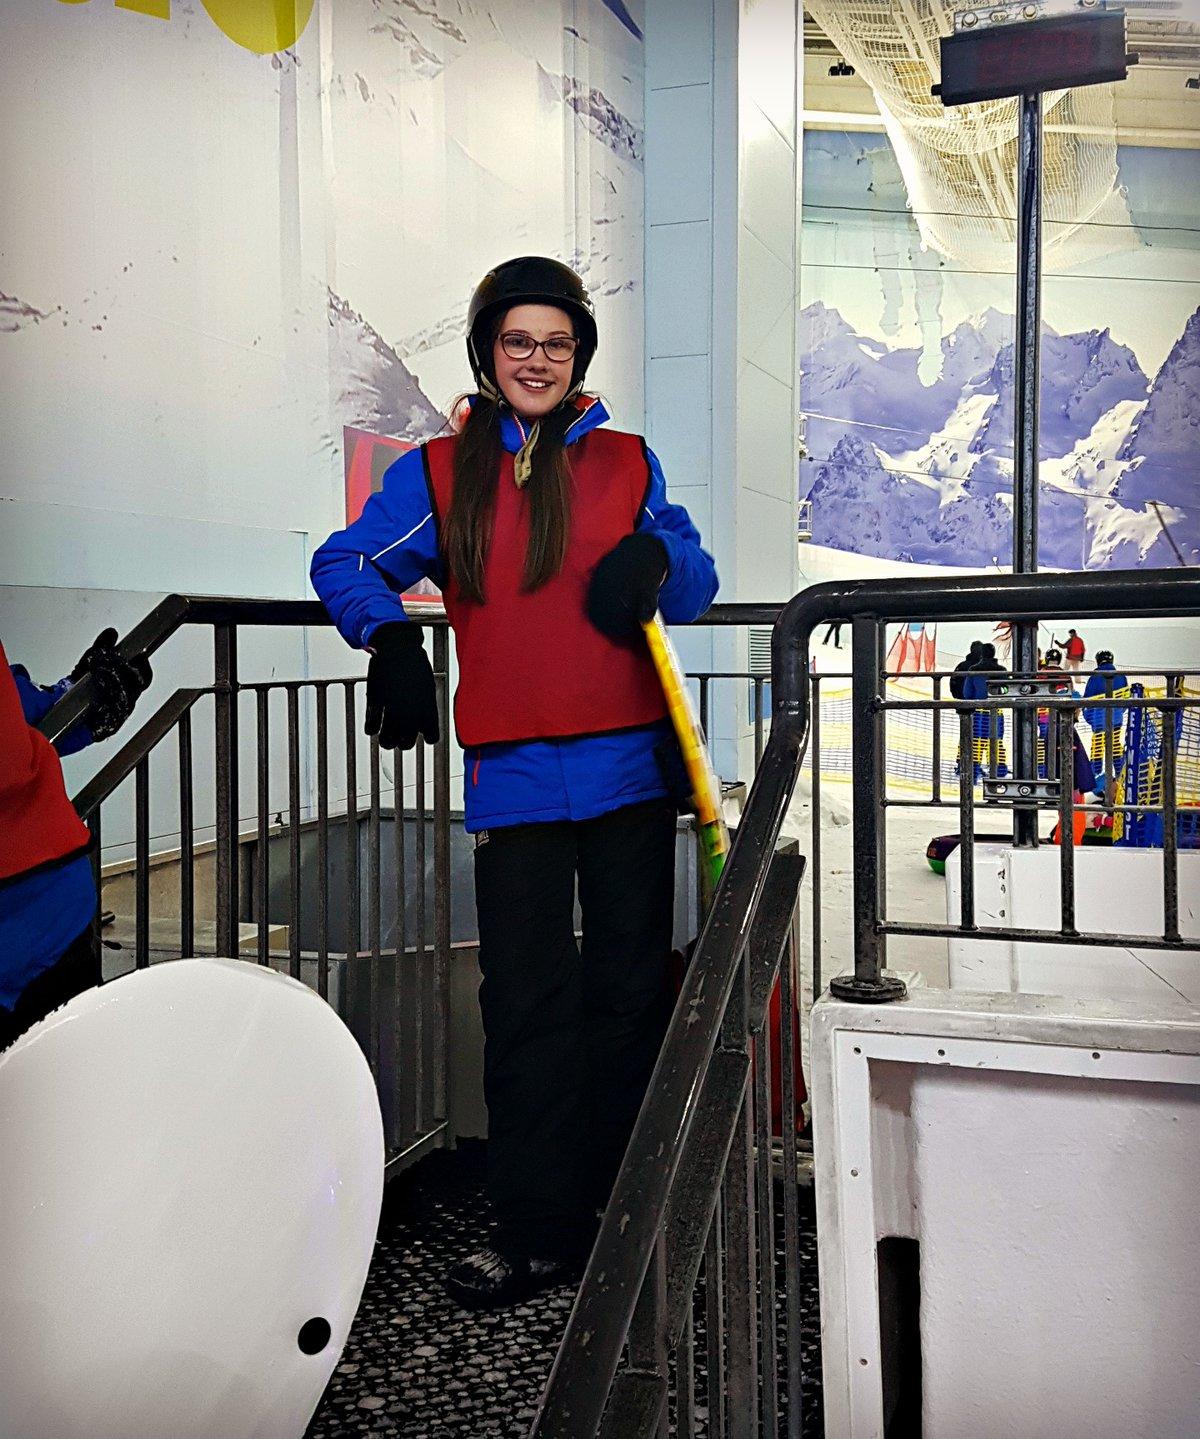 girl in ski clothing standing on steps